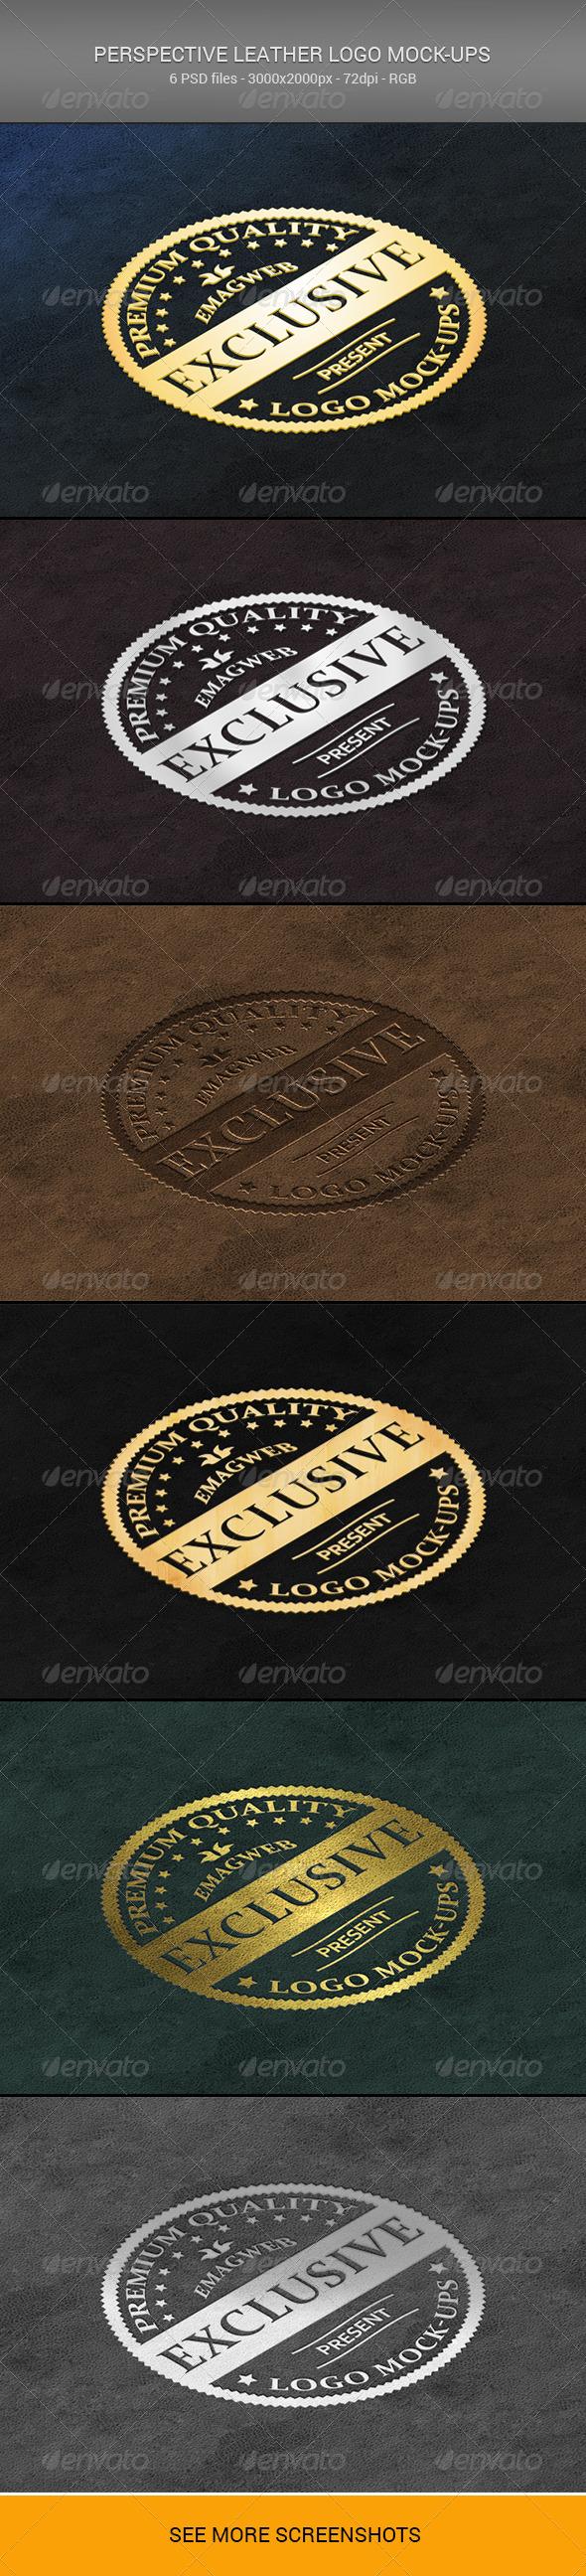 Perspective Leather Logo Mock-ups - Logo Product Mock-Ups